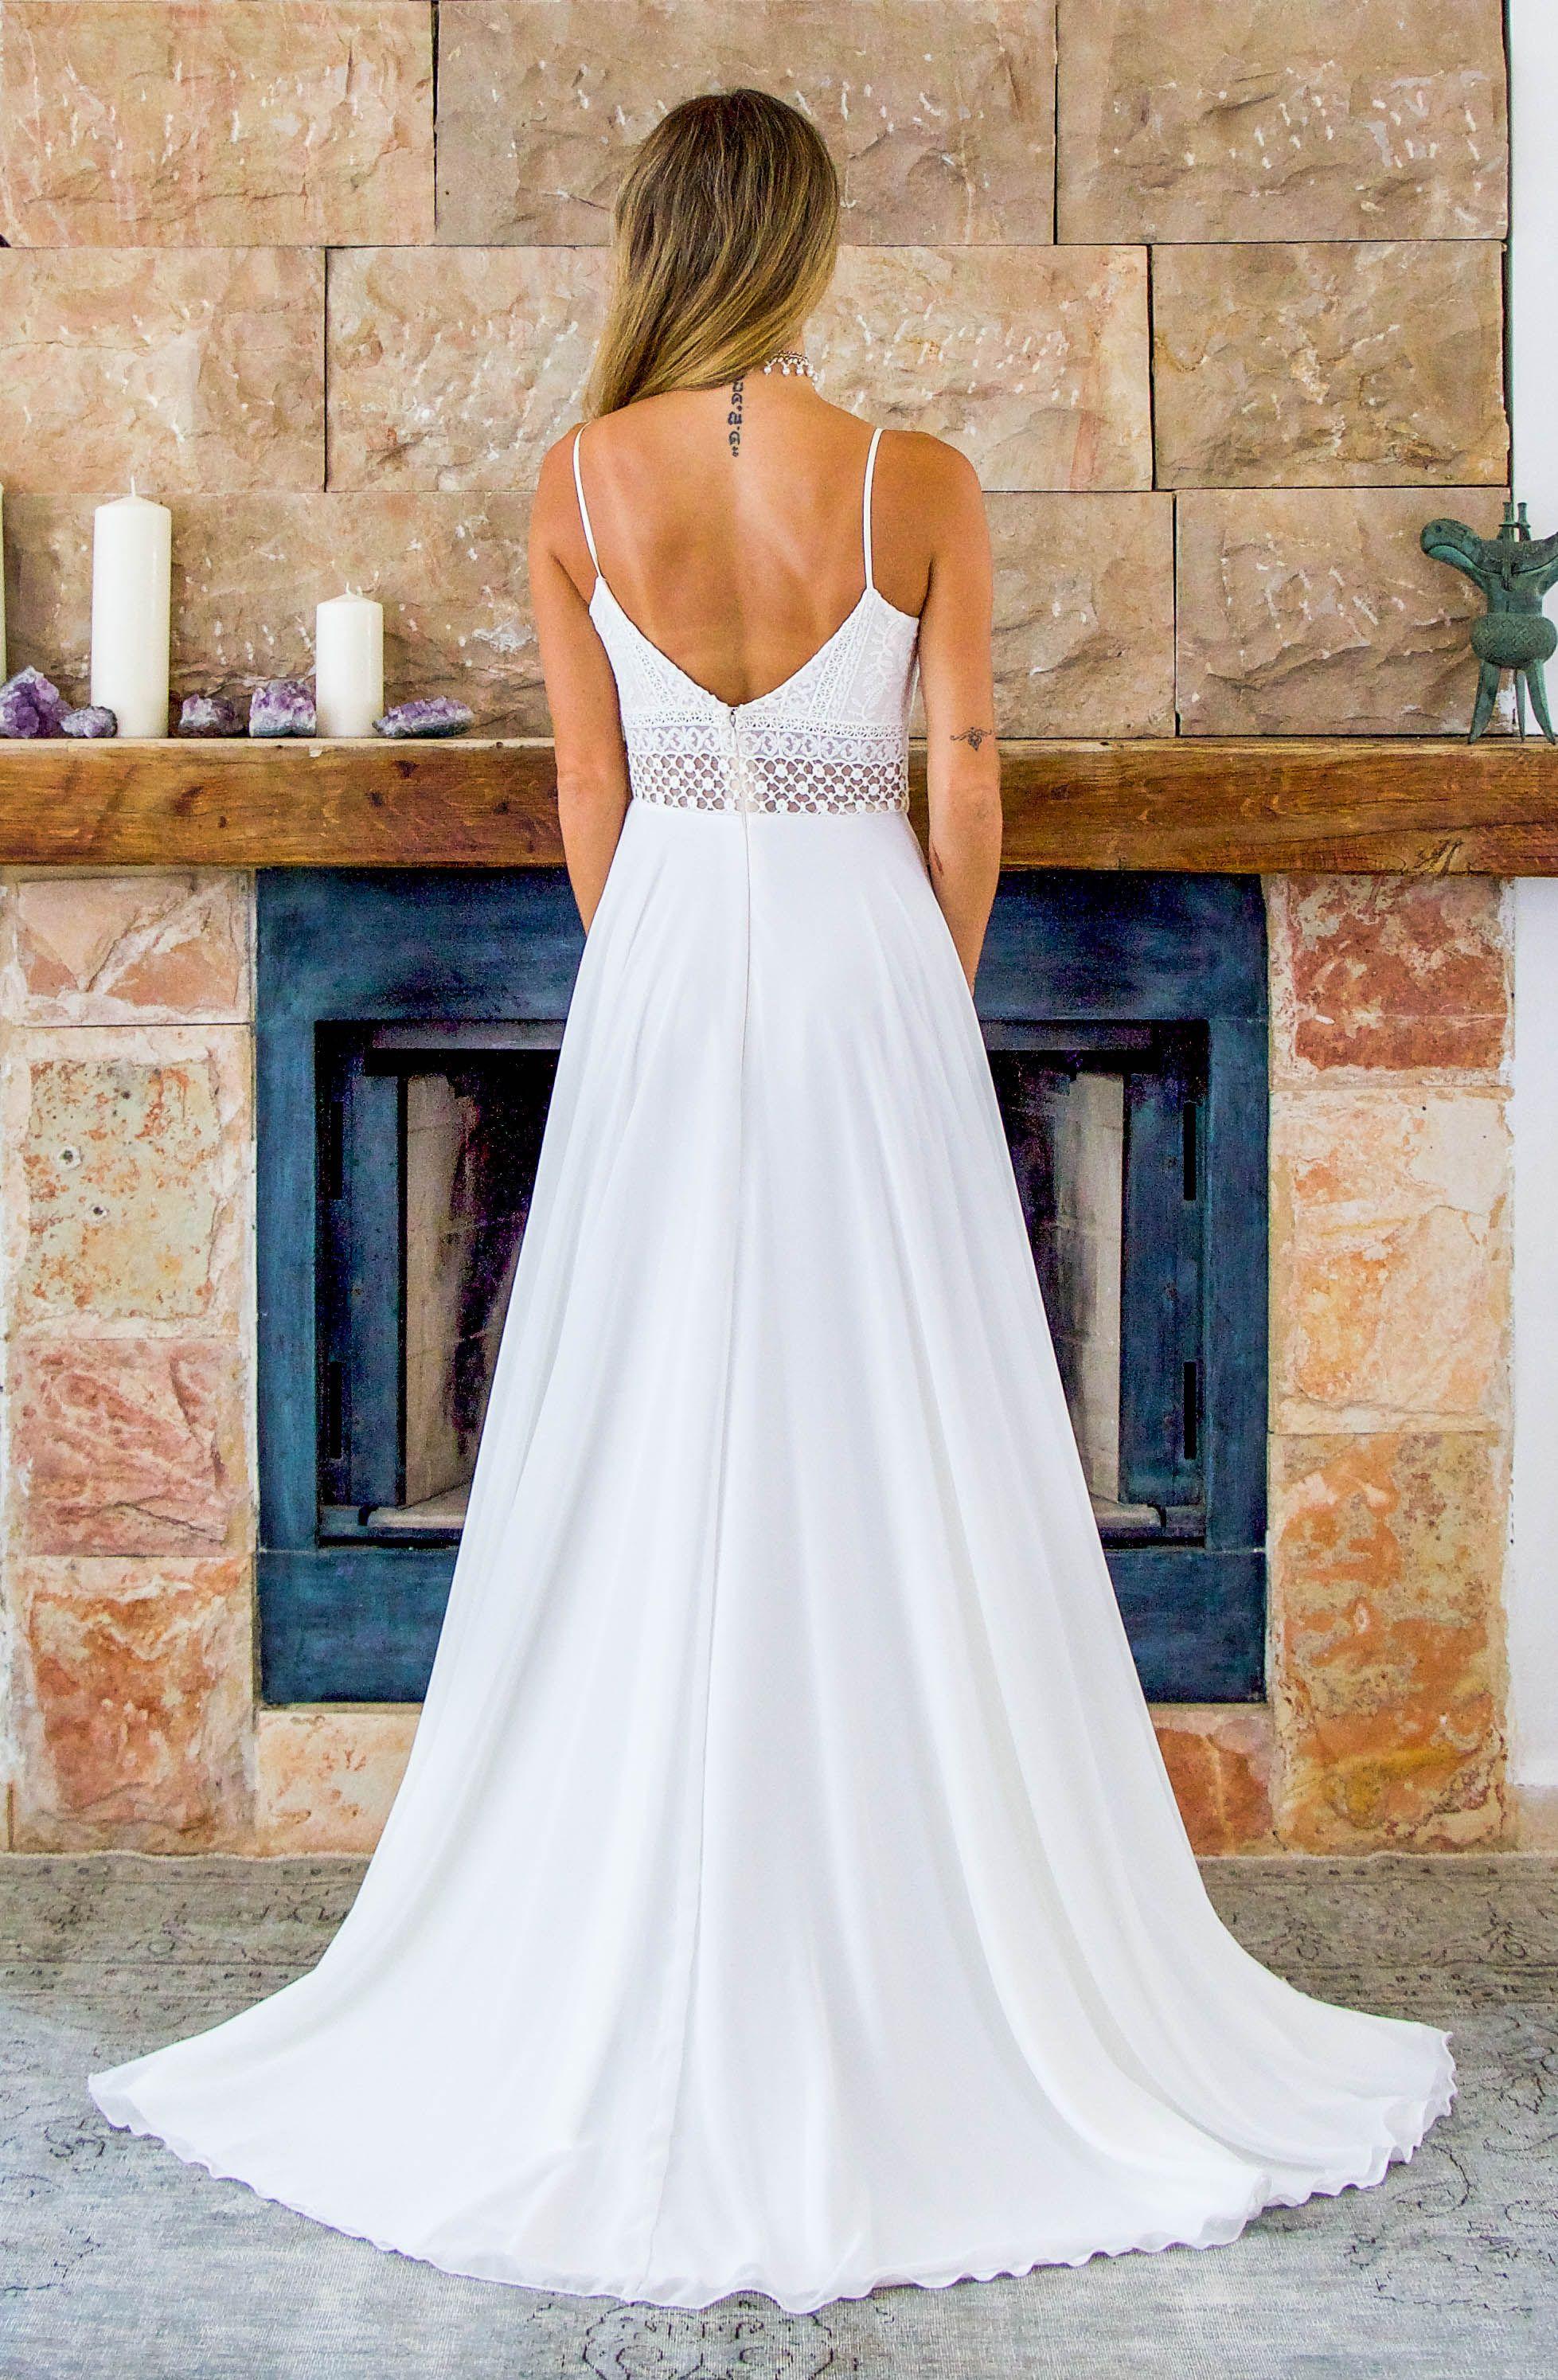 Boho wedding dress open back wedding dress v neck wedding dress